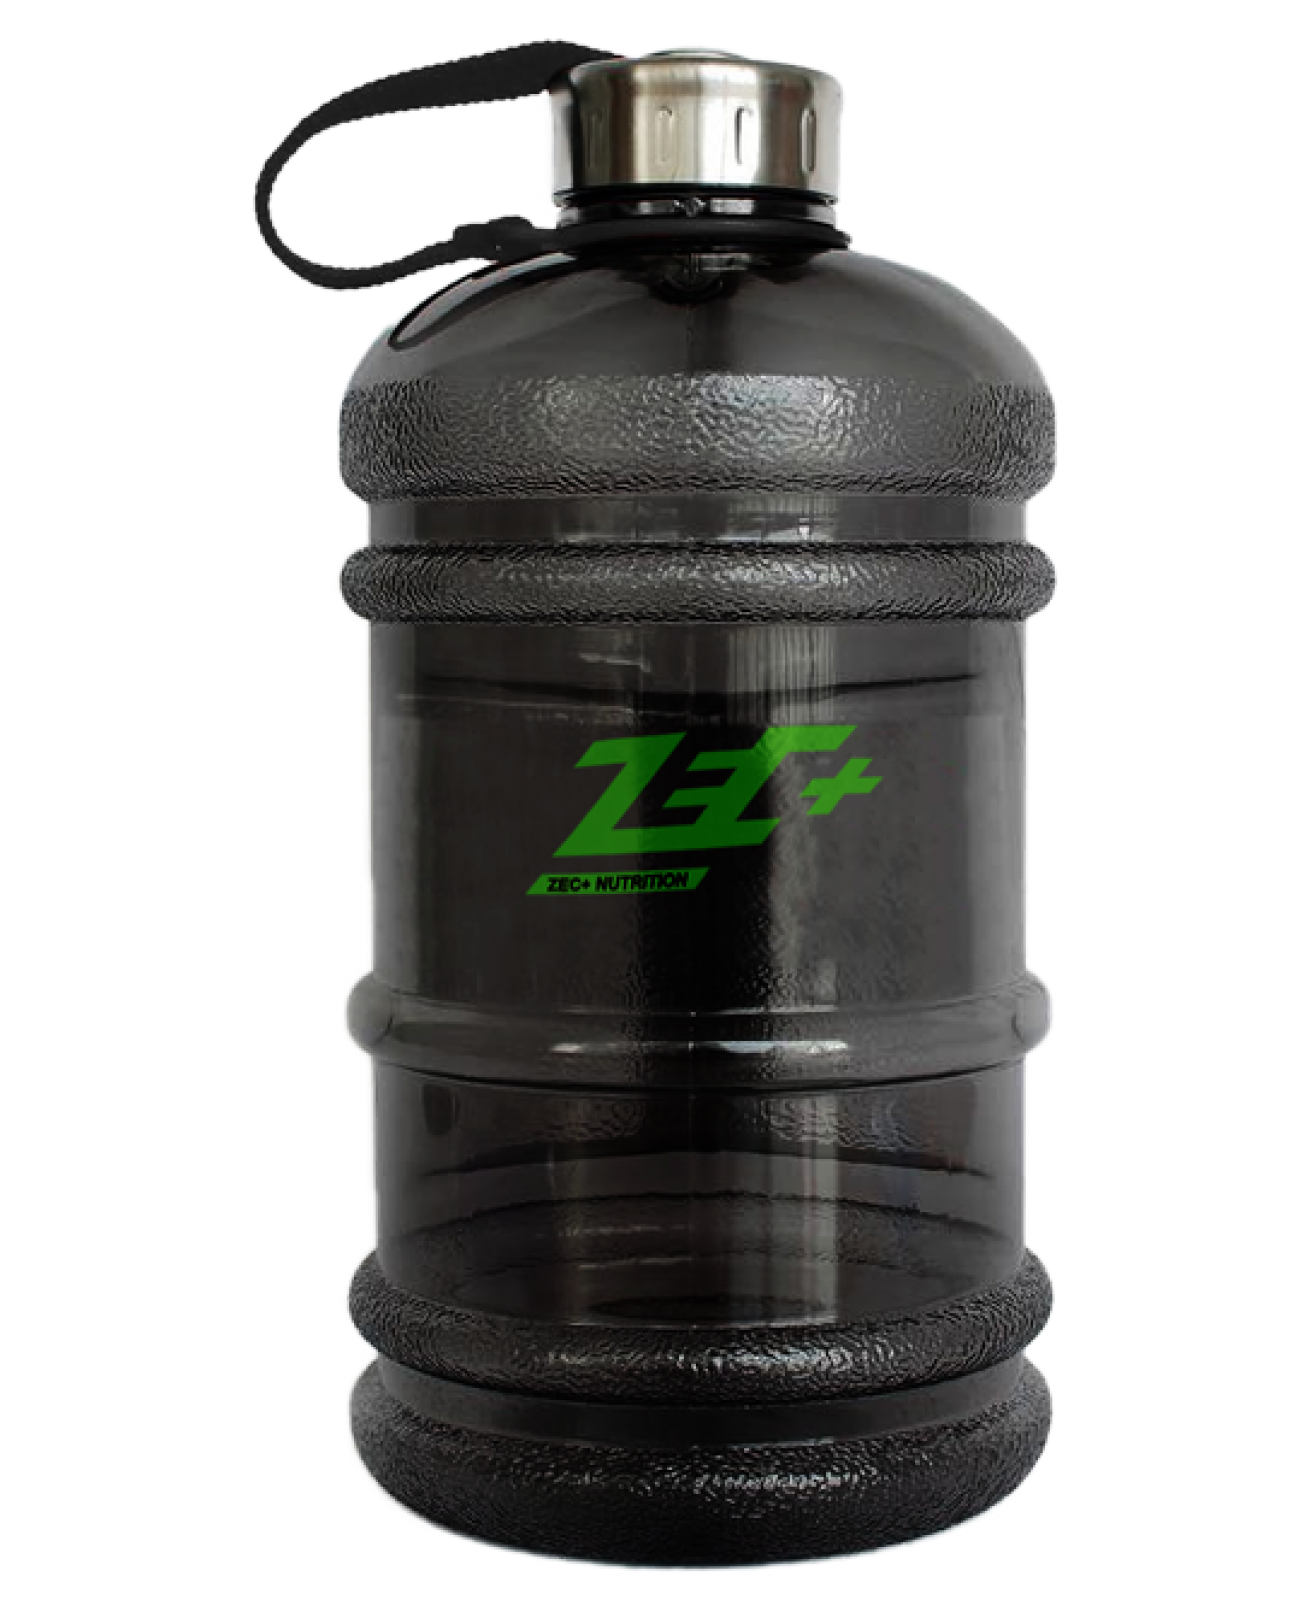 zec plus nutrition water gallon fitshop. Black Bedroom Furniture Sets. Home Design Ideas